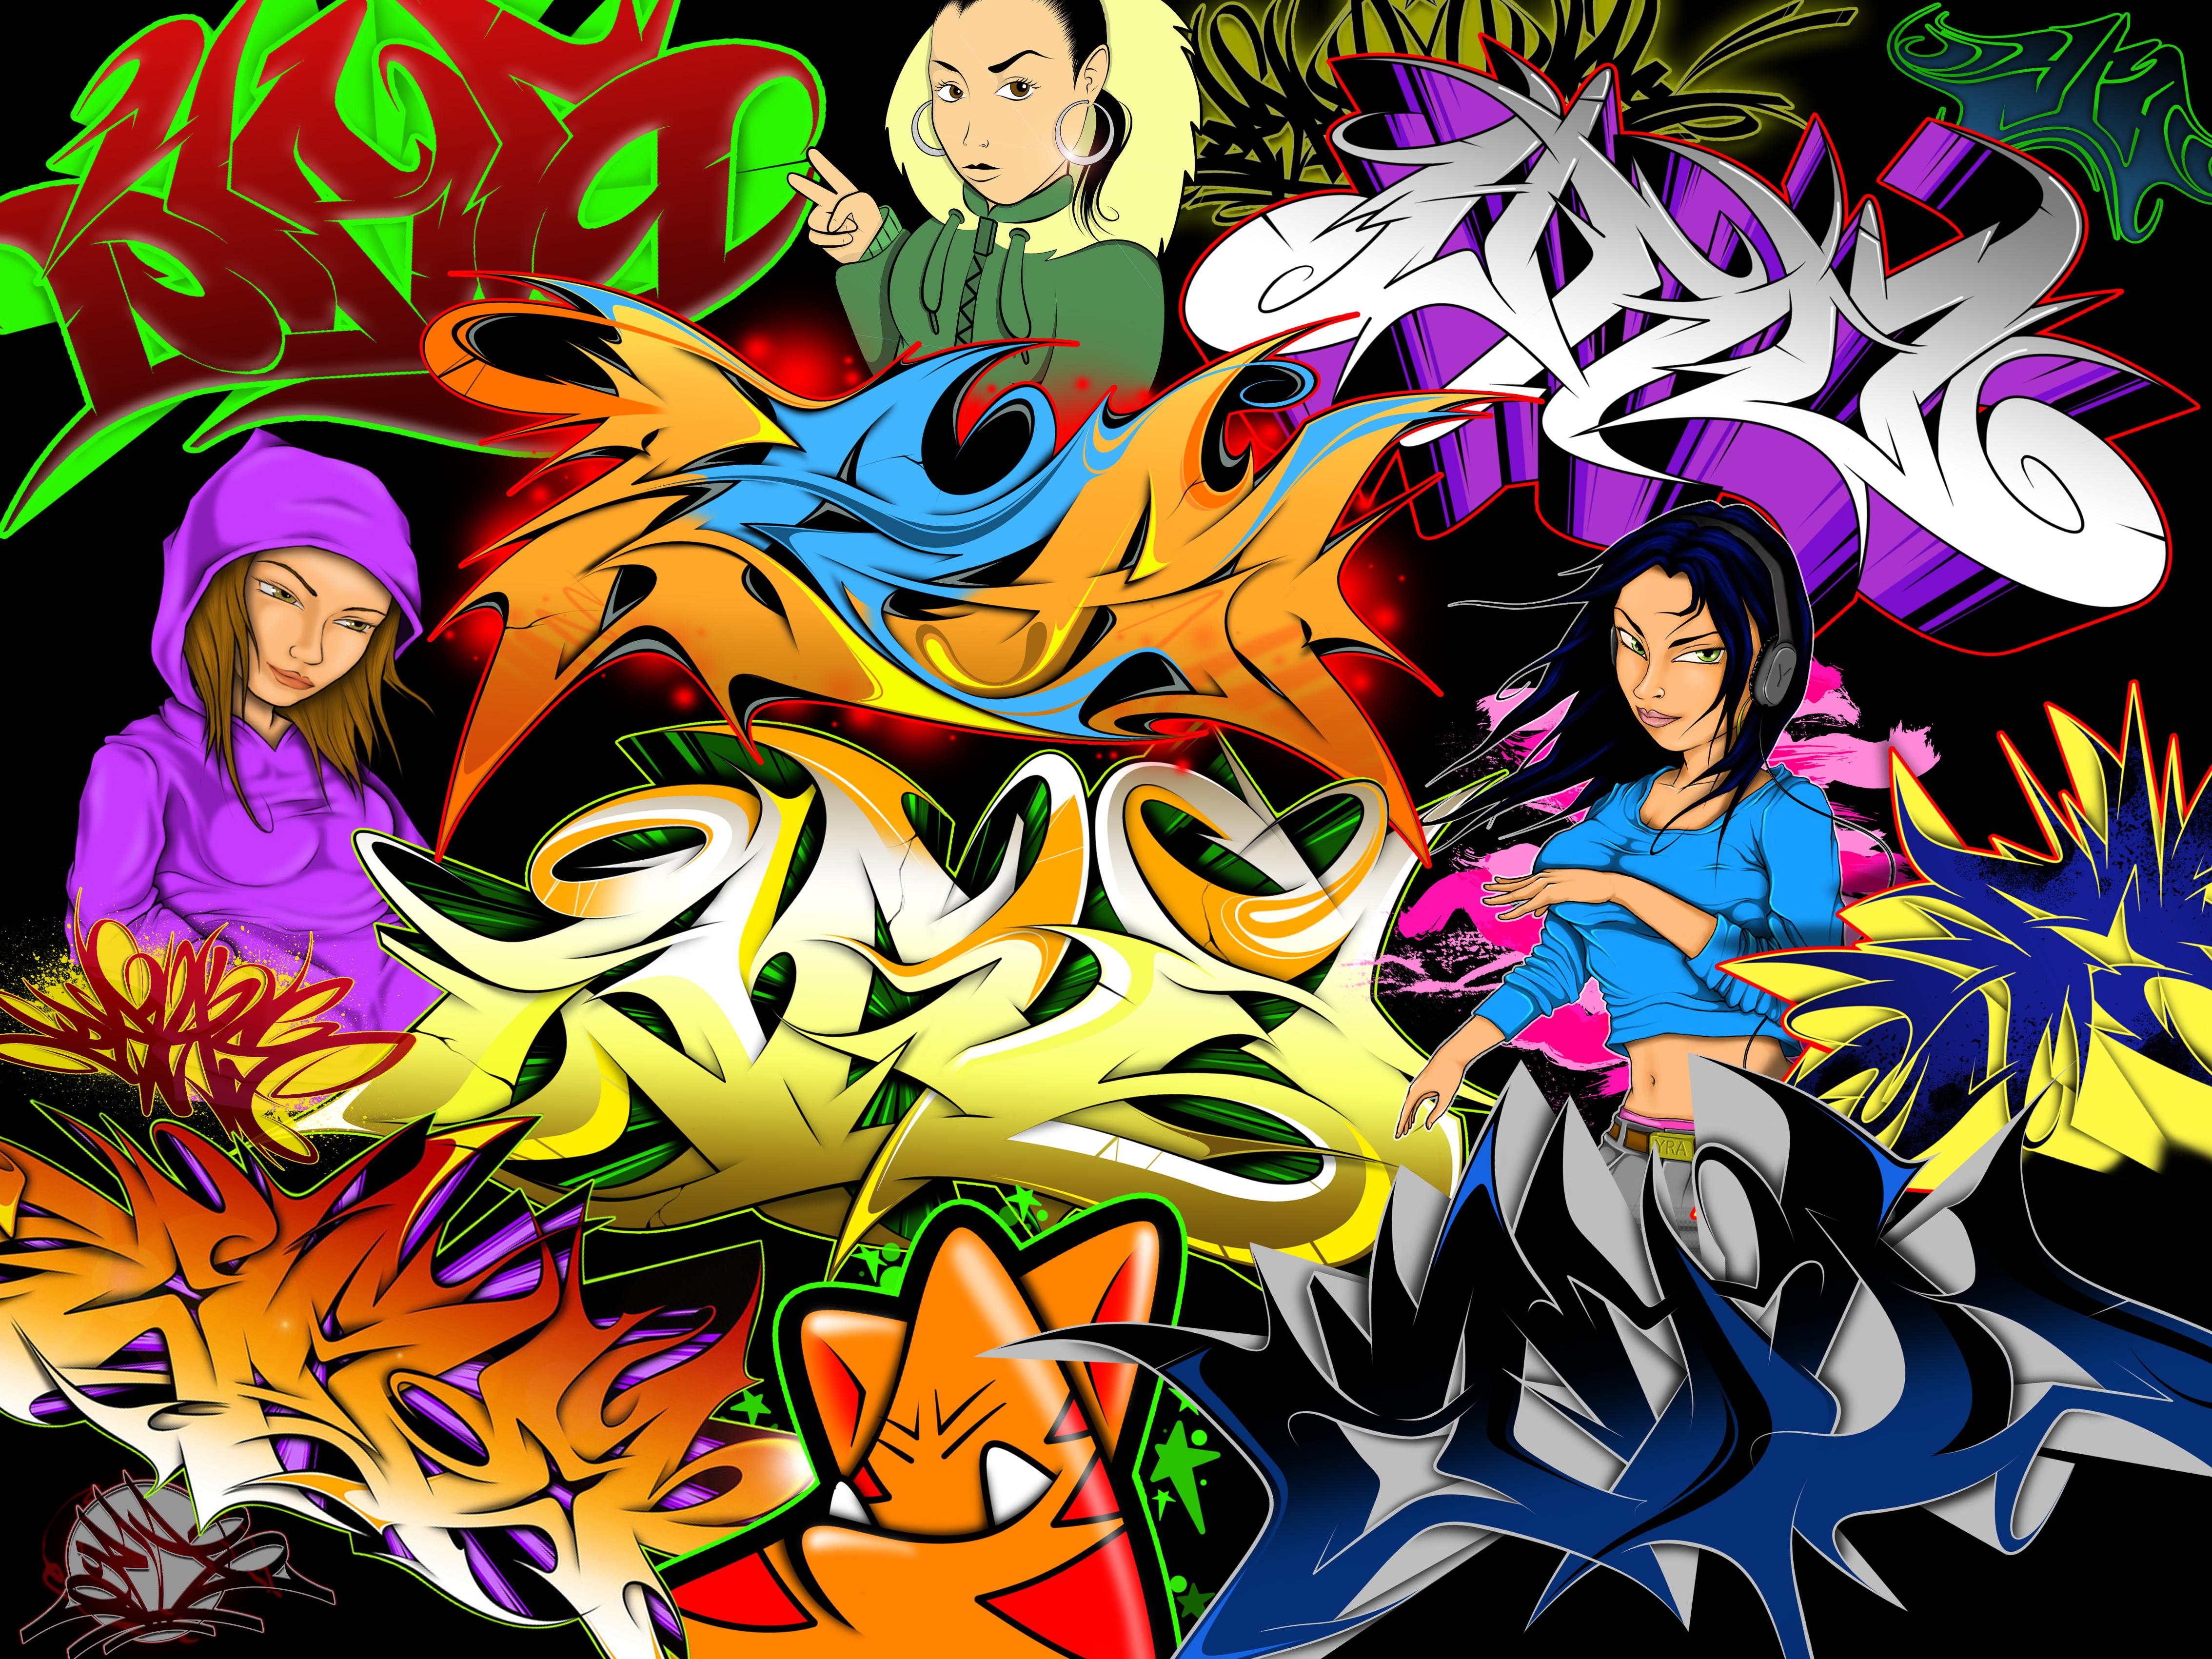 Graffiti collage by yrastilo